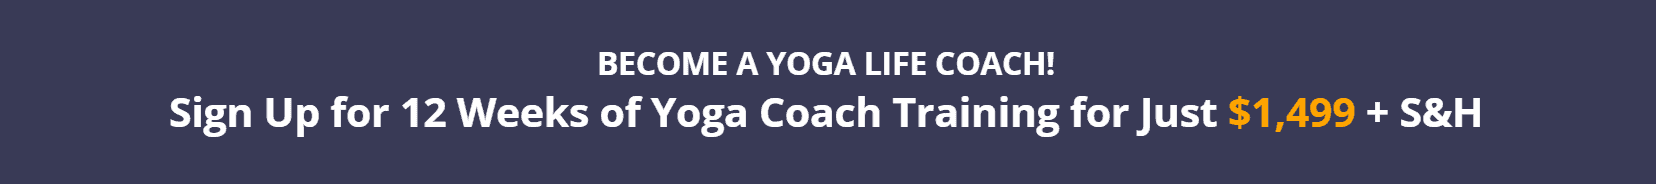 Coach Training Alliance Review- Yoga Life Coaching Pricing